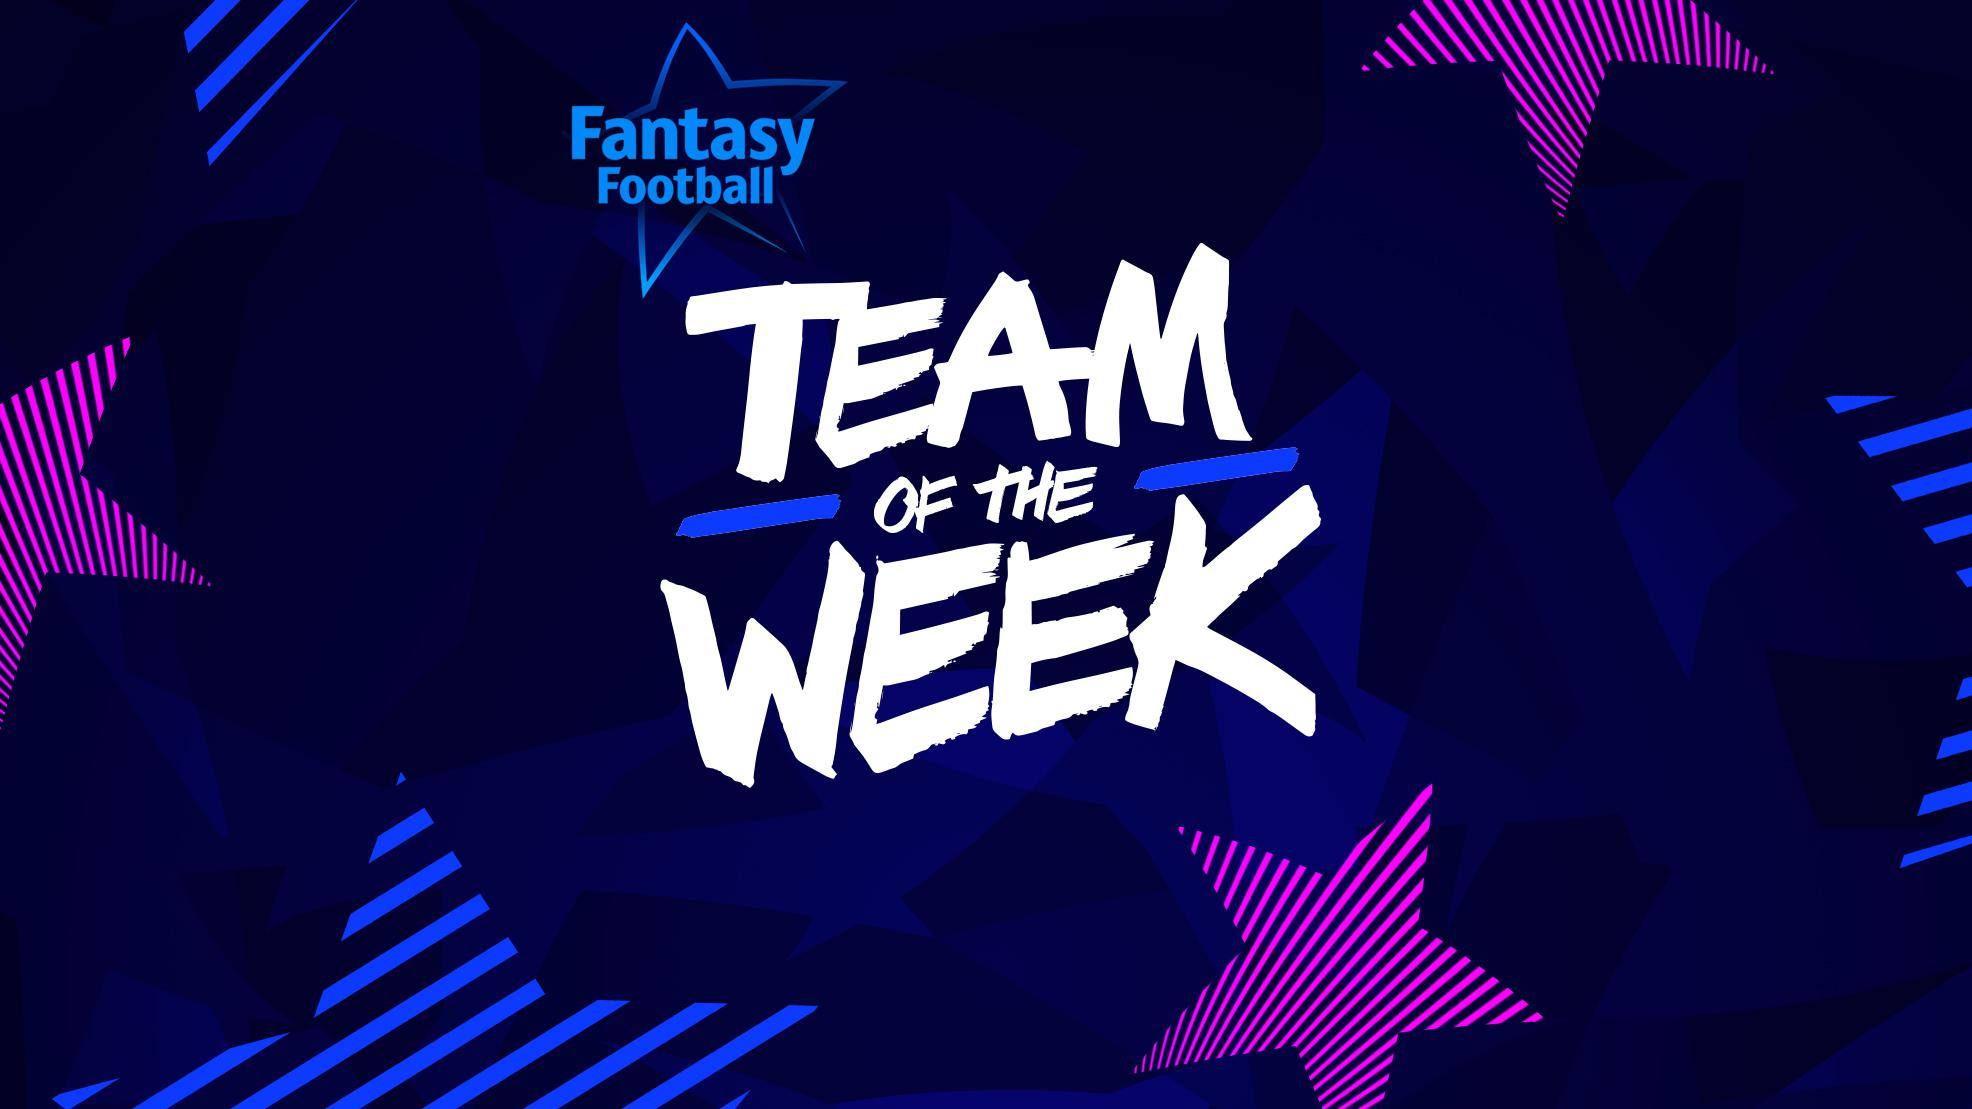 Fantasy Football Team of the Week